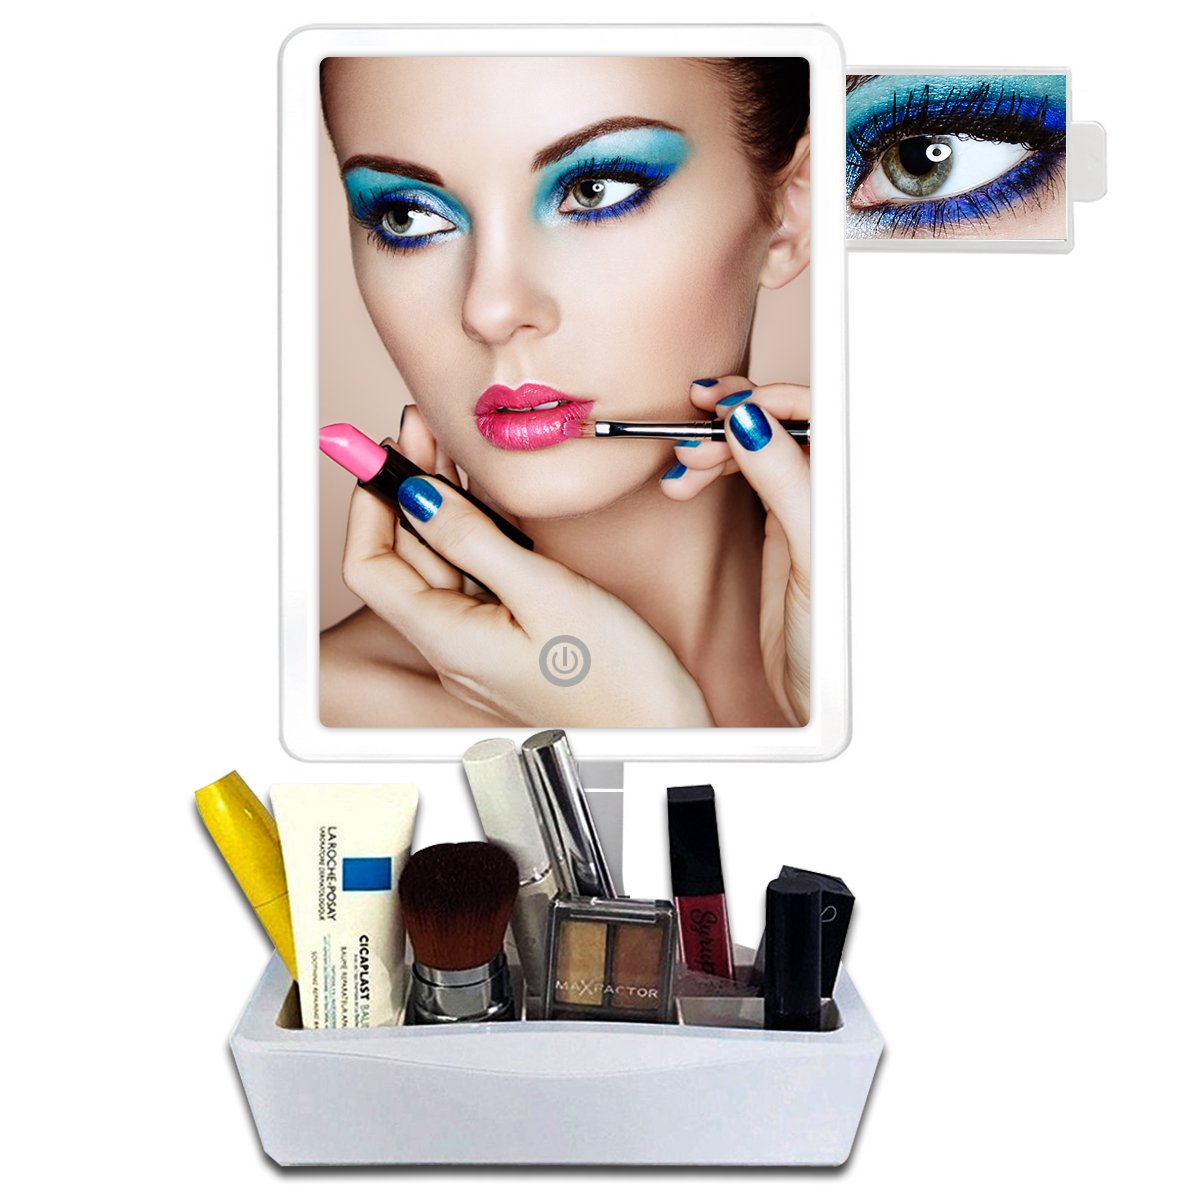 Buy Kedsum 5x Magnifying Lighted Makeup Mirror Desktop Vanity Mirror